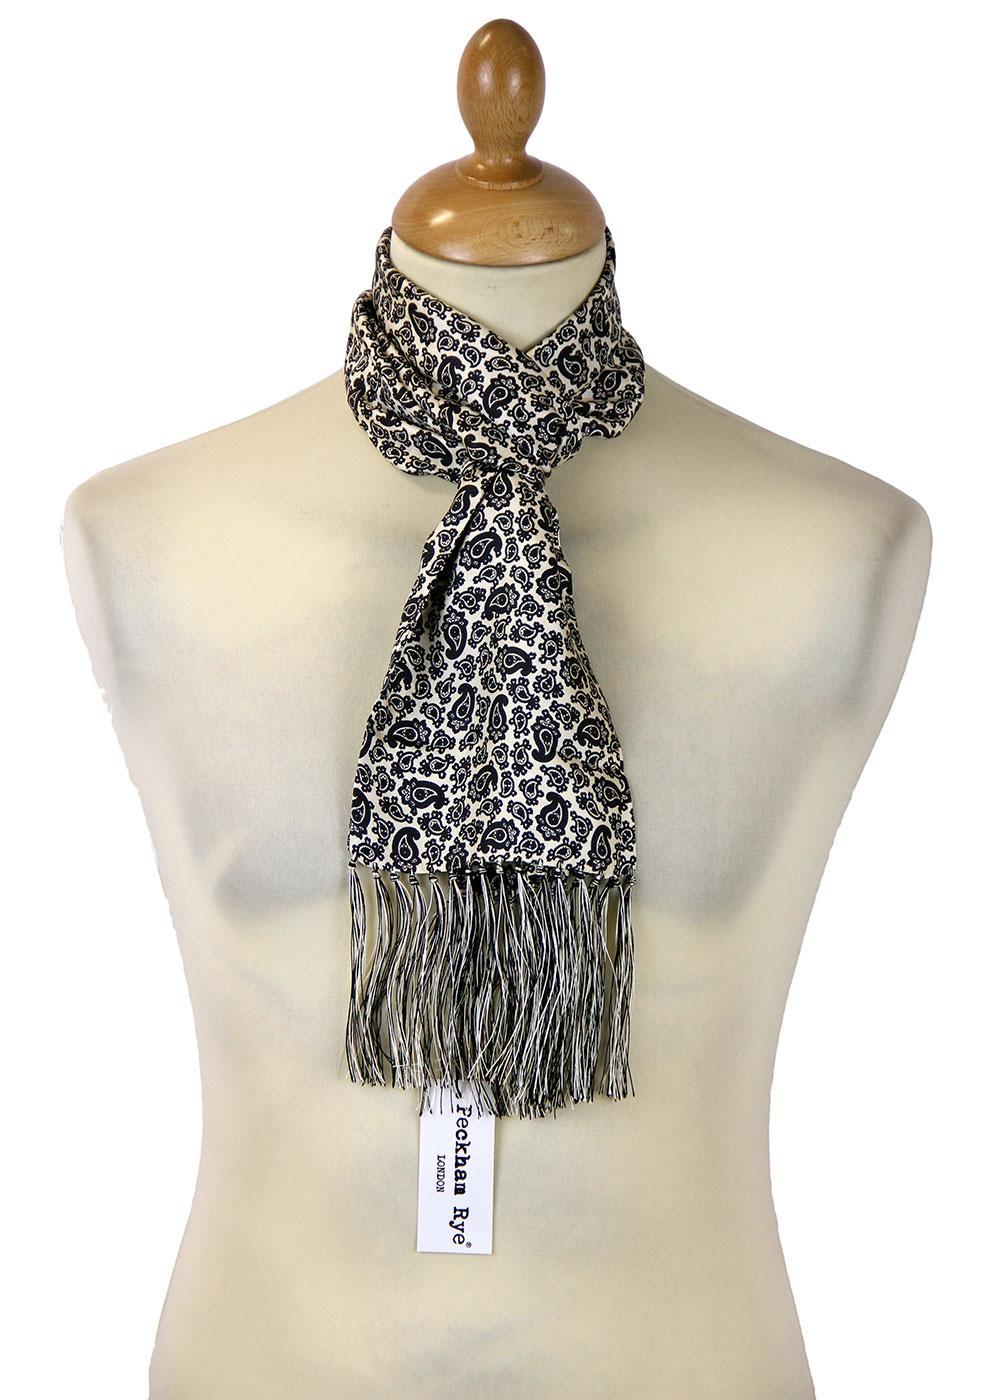 peckham rye retro 60s mod paisley silk scarf white ground